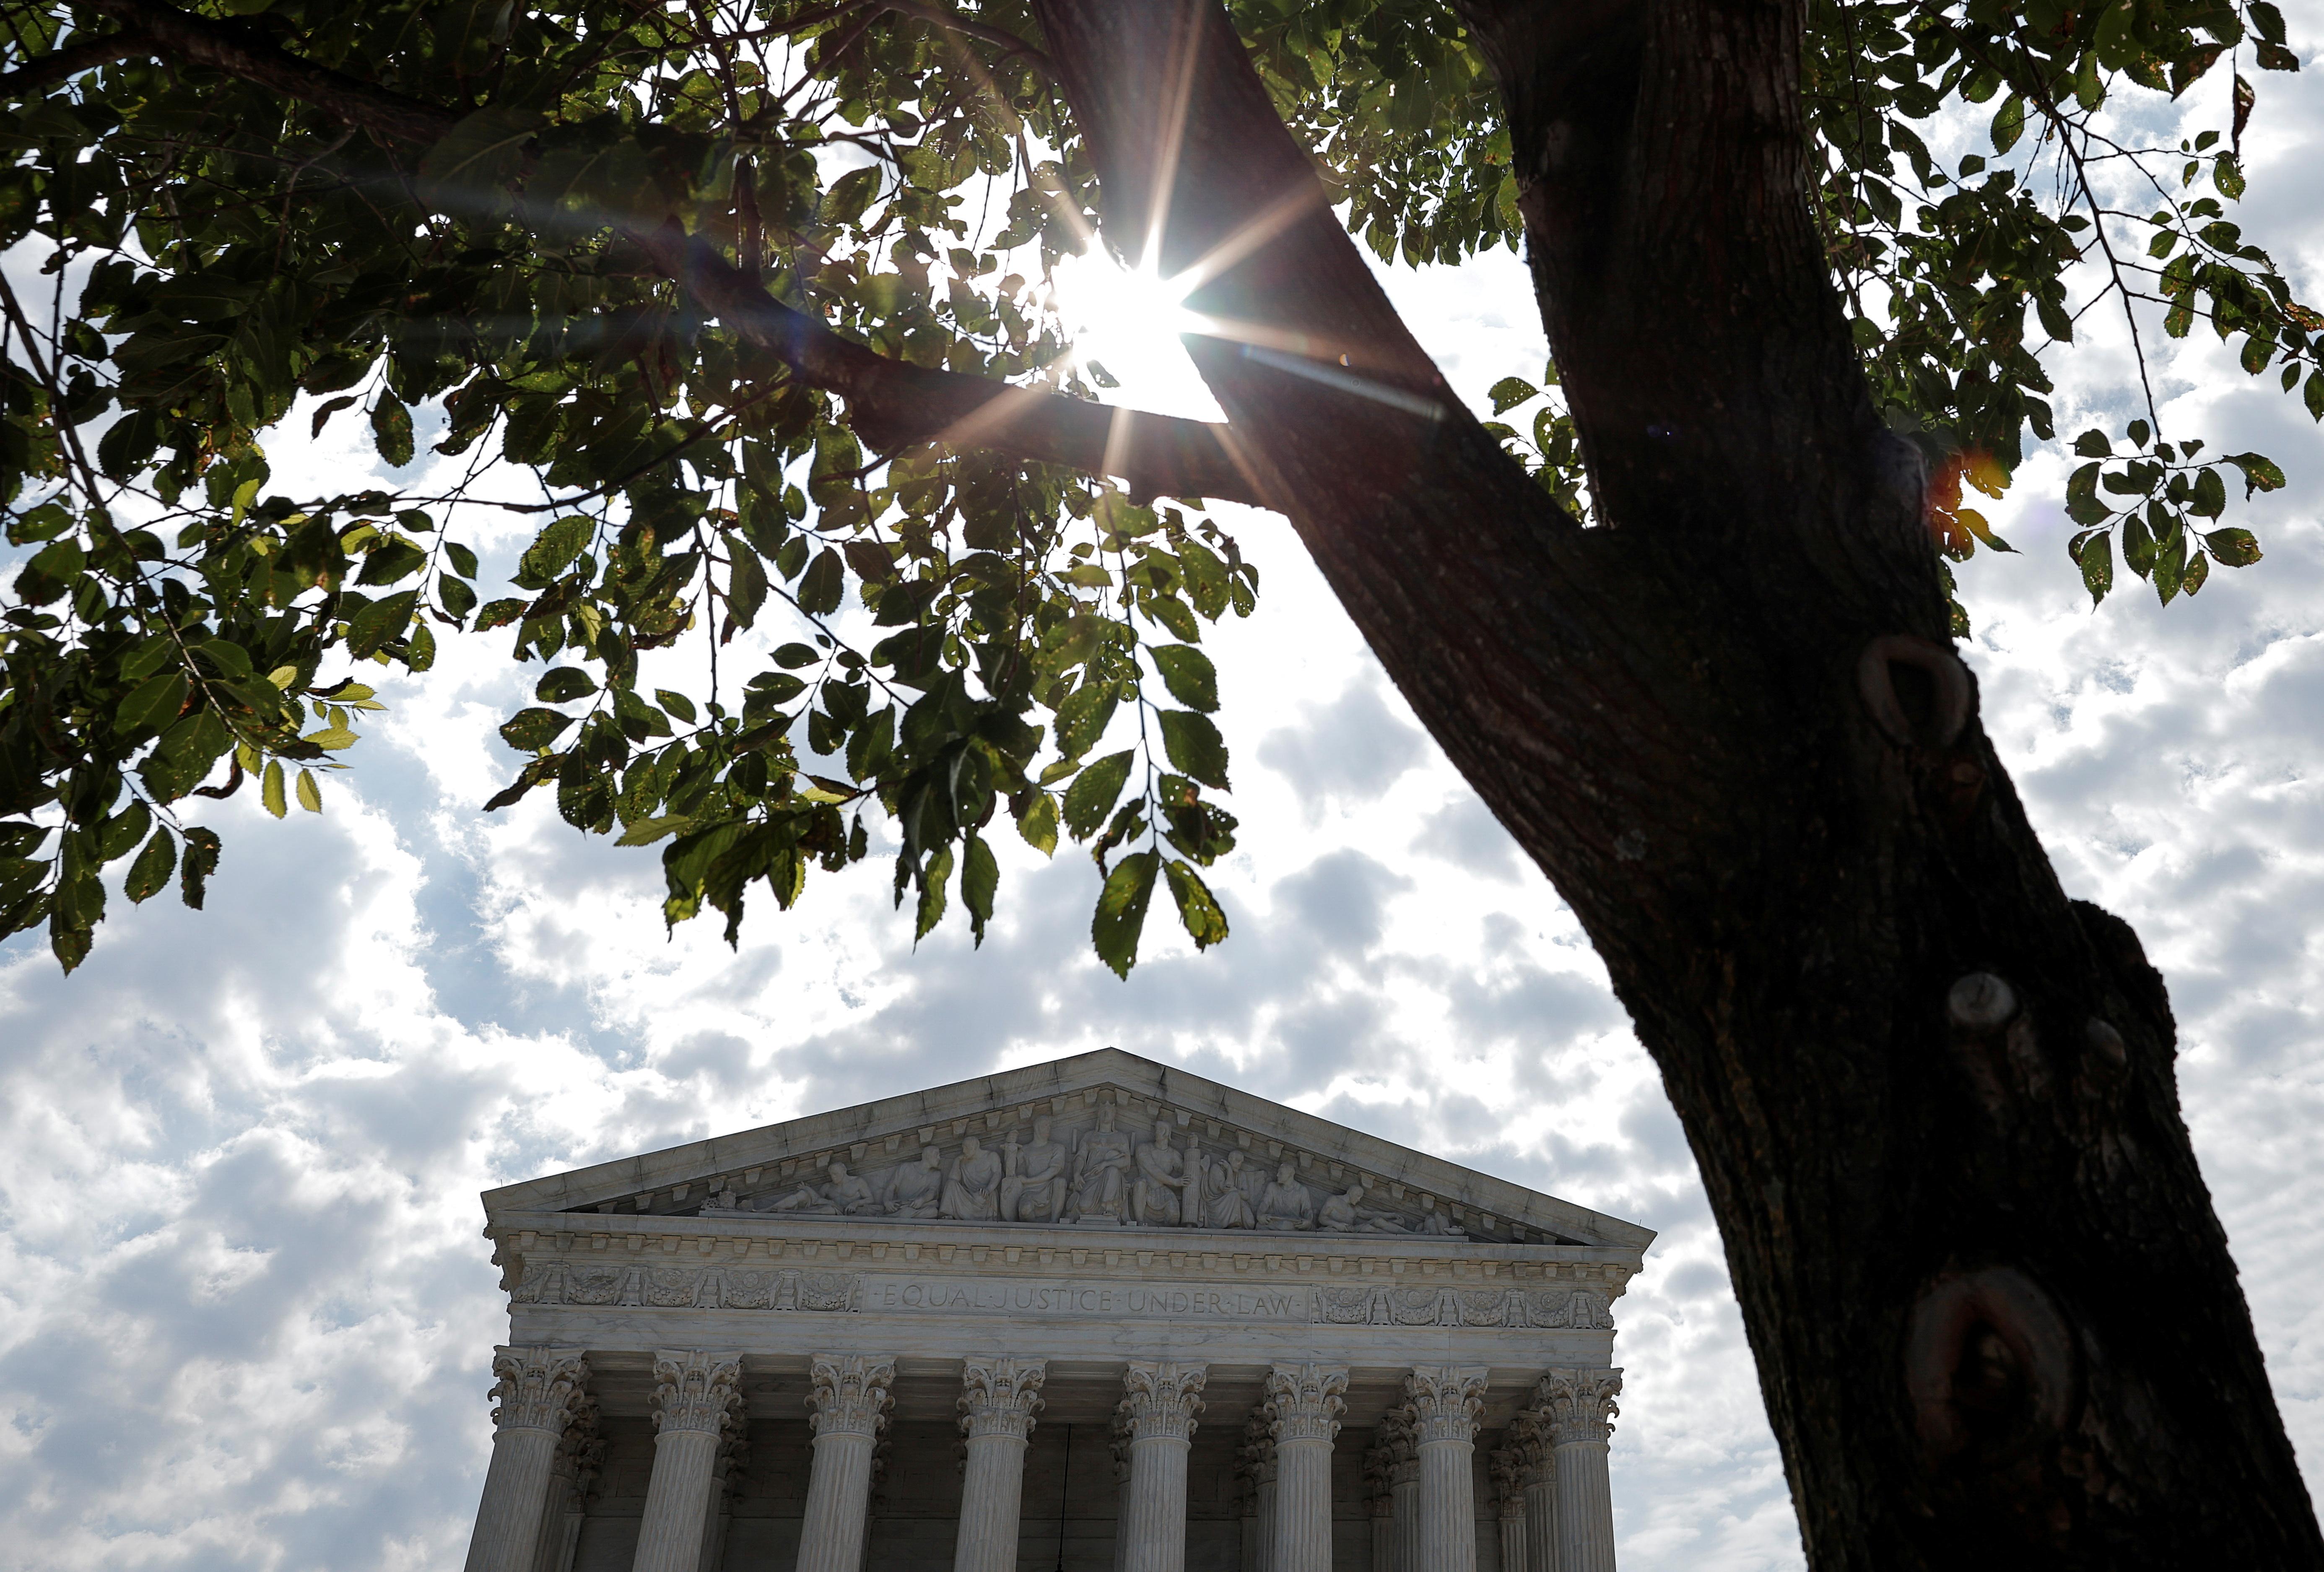 The U.S. Supreme Court is seen in Washington, U.S., June 14, 2021. REUTERS/Carlos Barria